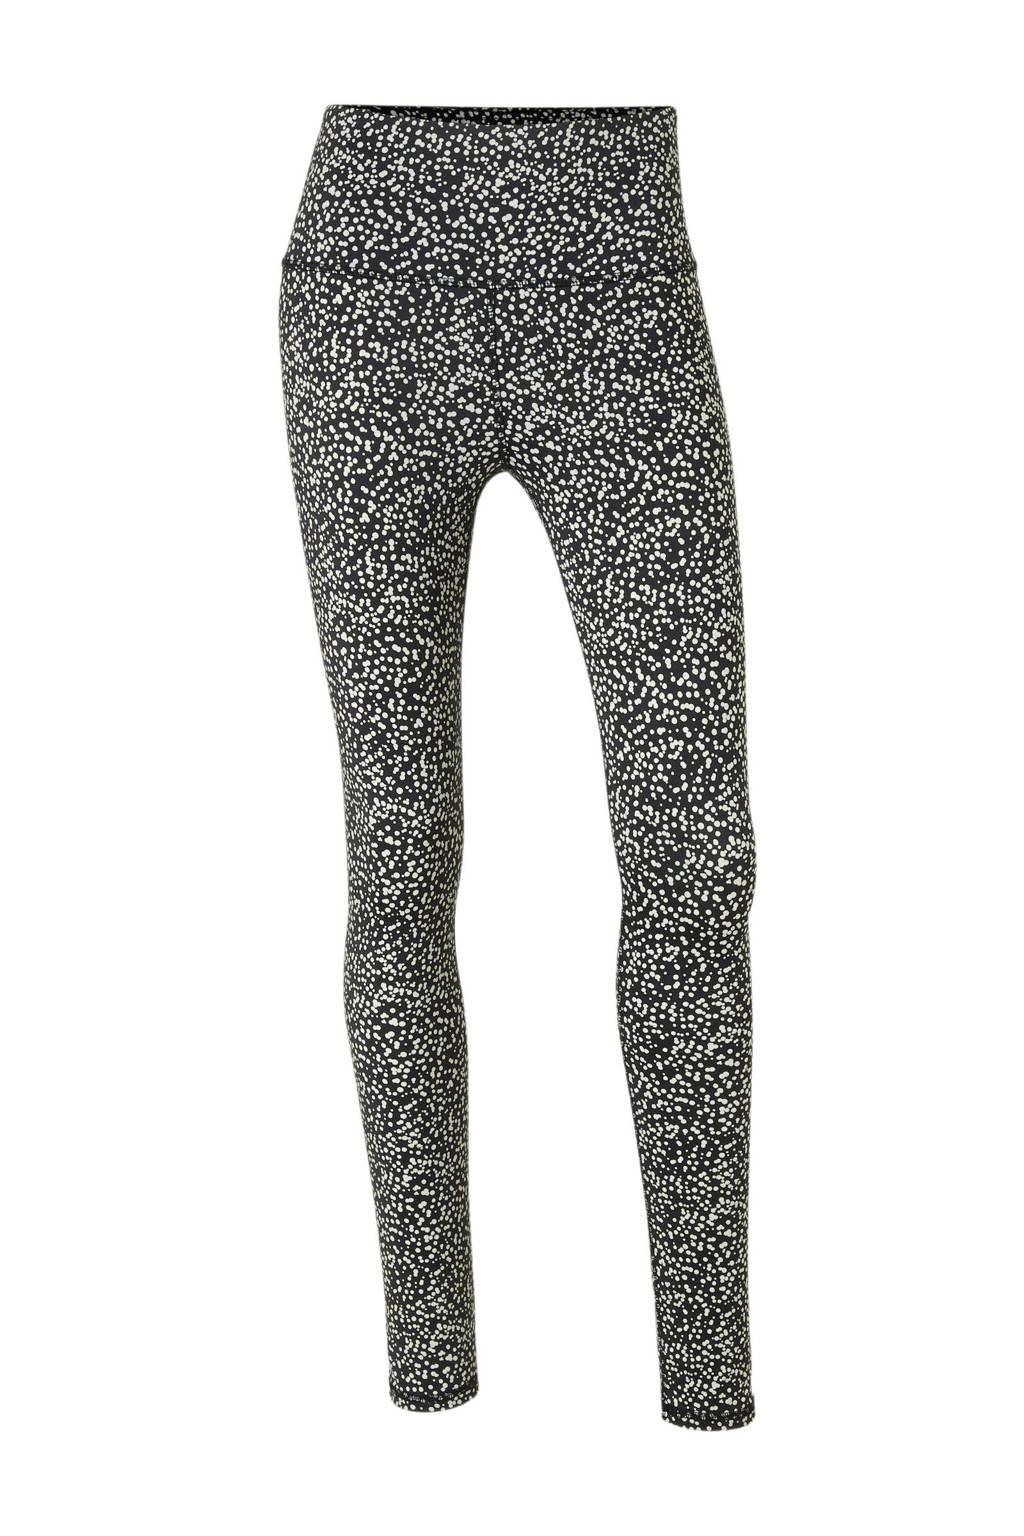 10DAYS legging met all over print, Zwart/ecru